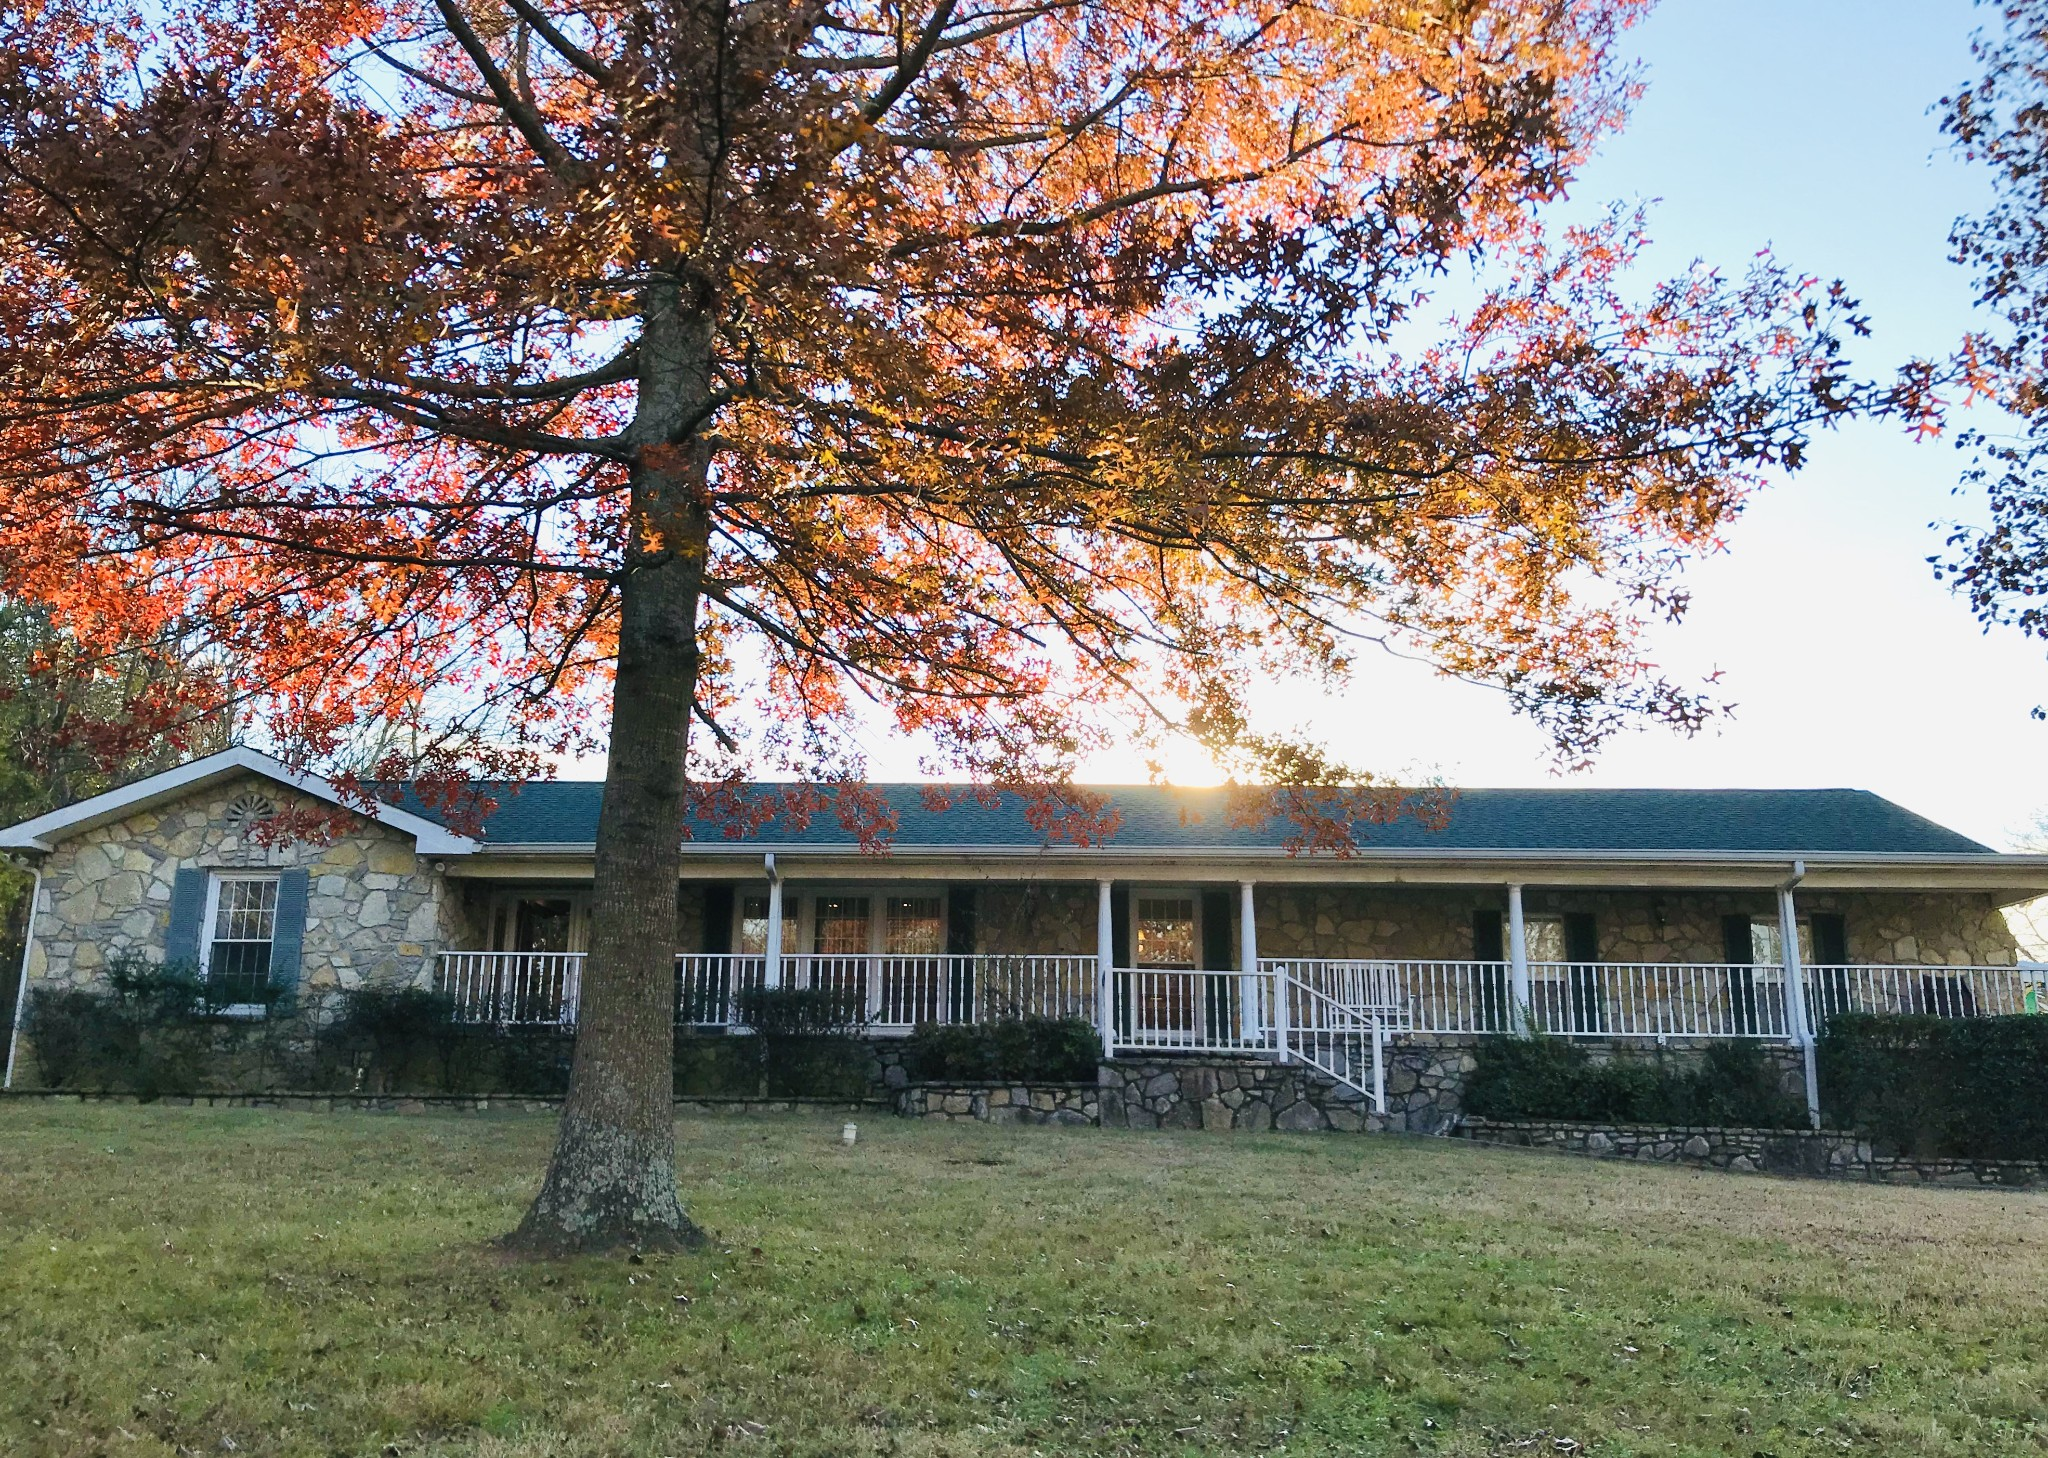 566 Old Nashville Hwy, LA VERGNE, TN 37086 - LA VERGNE, TN real estate listing